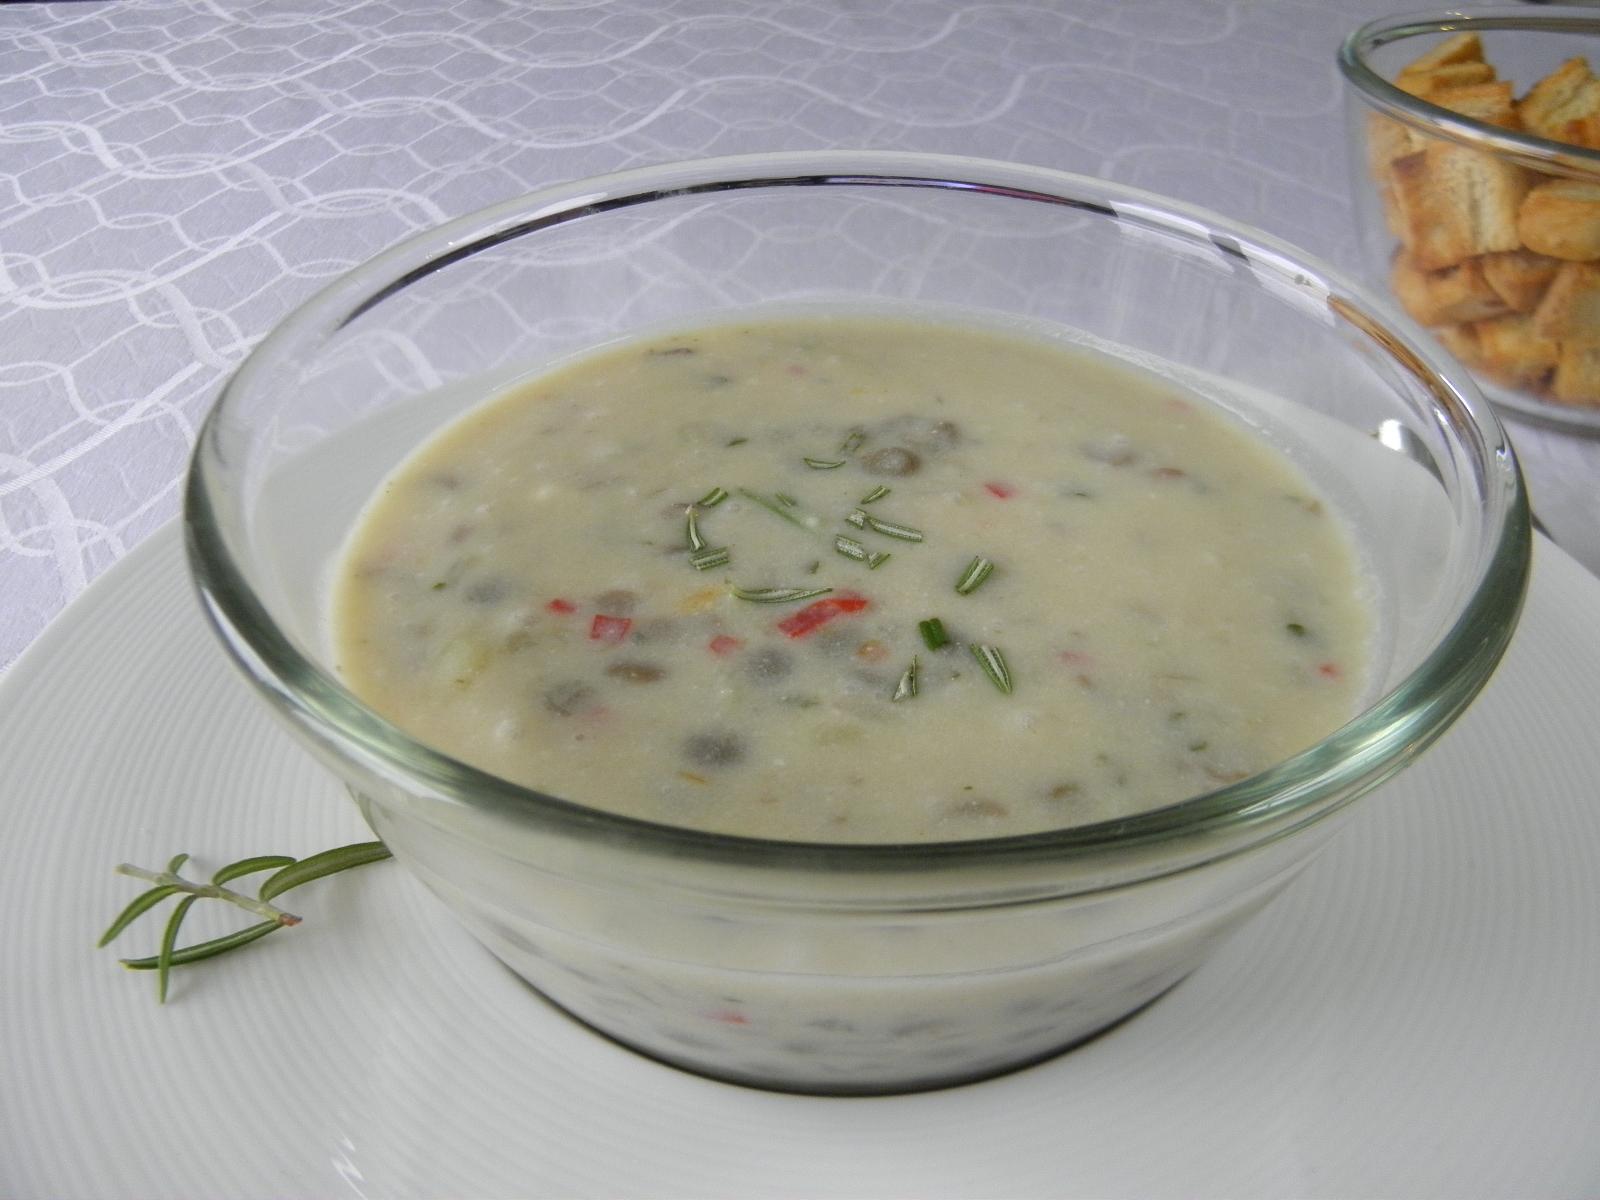 Pikantní polévka s brynzou a čočkou